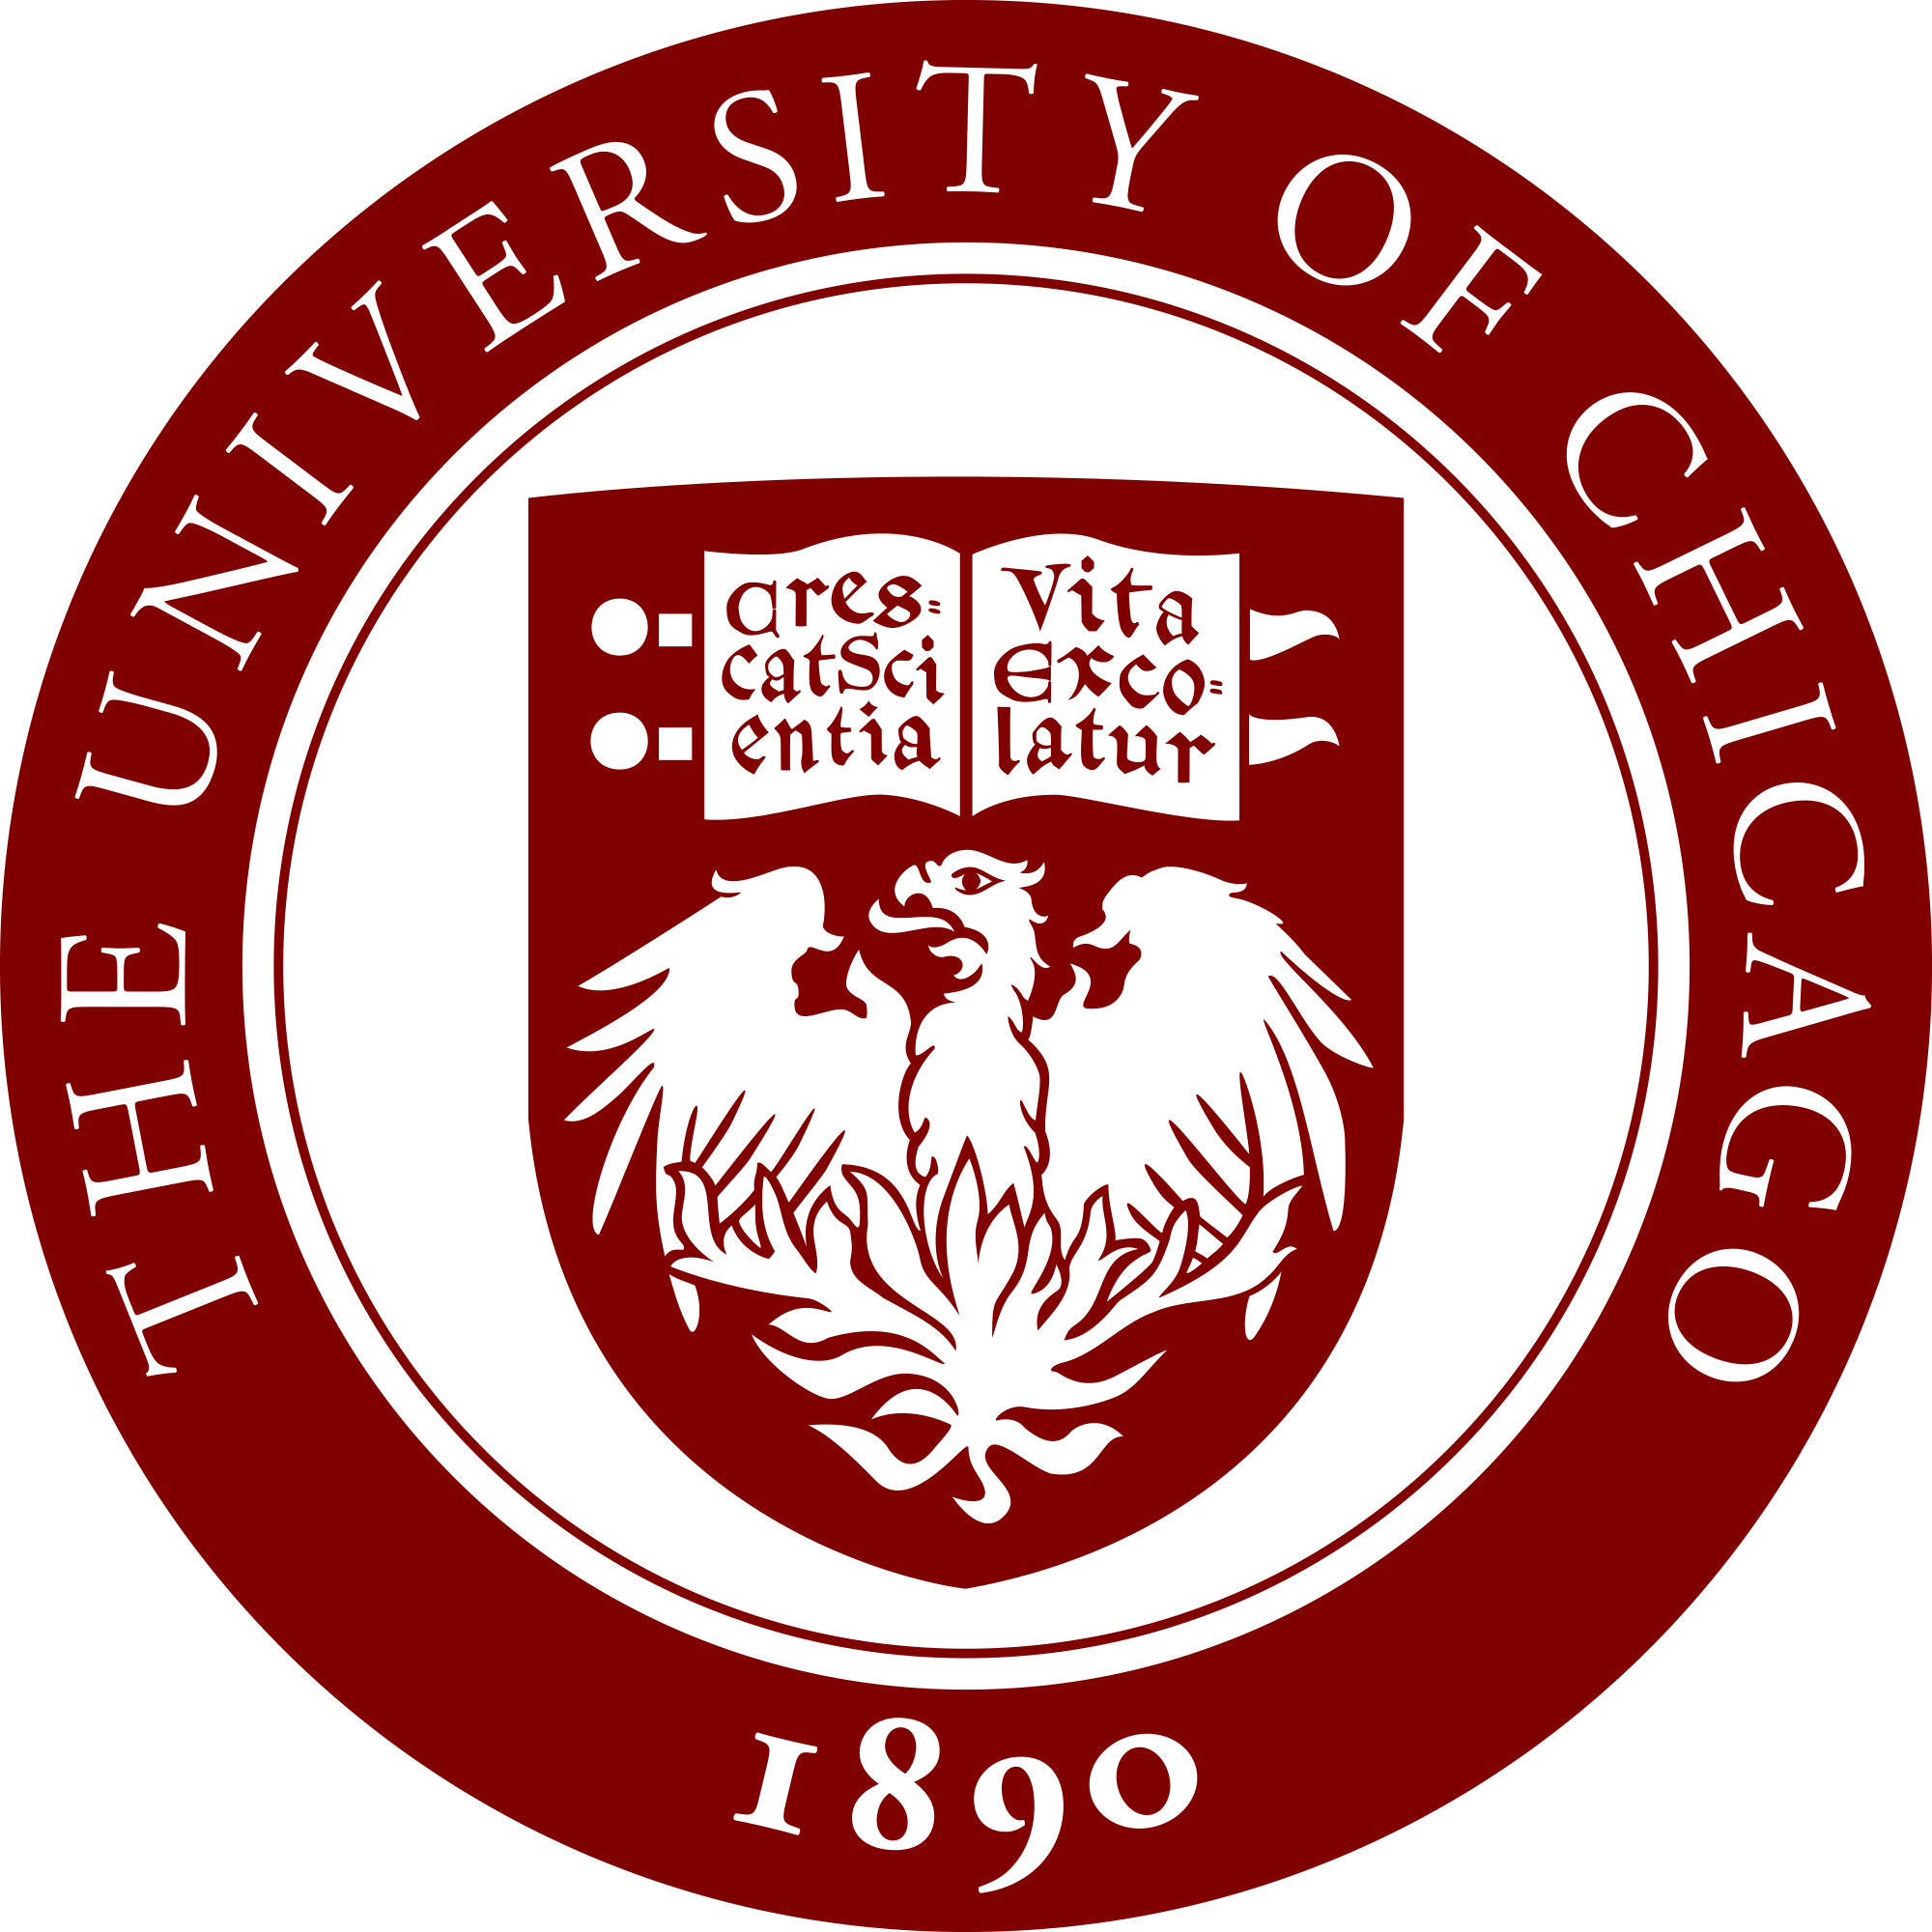 University of chicago Logos.